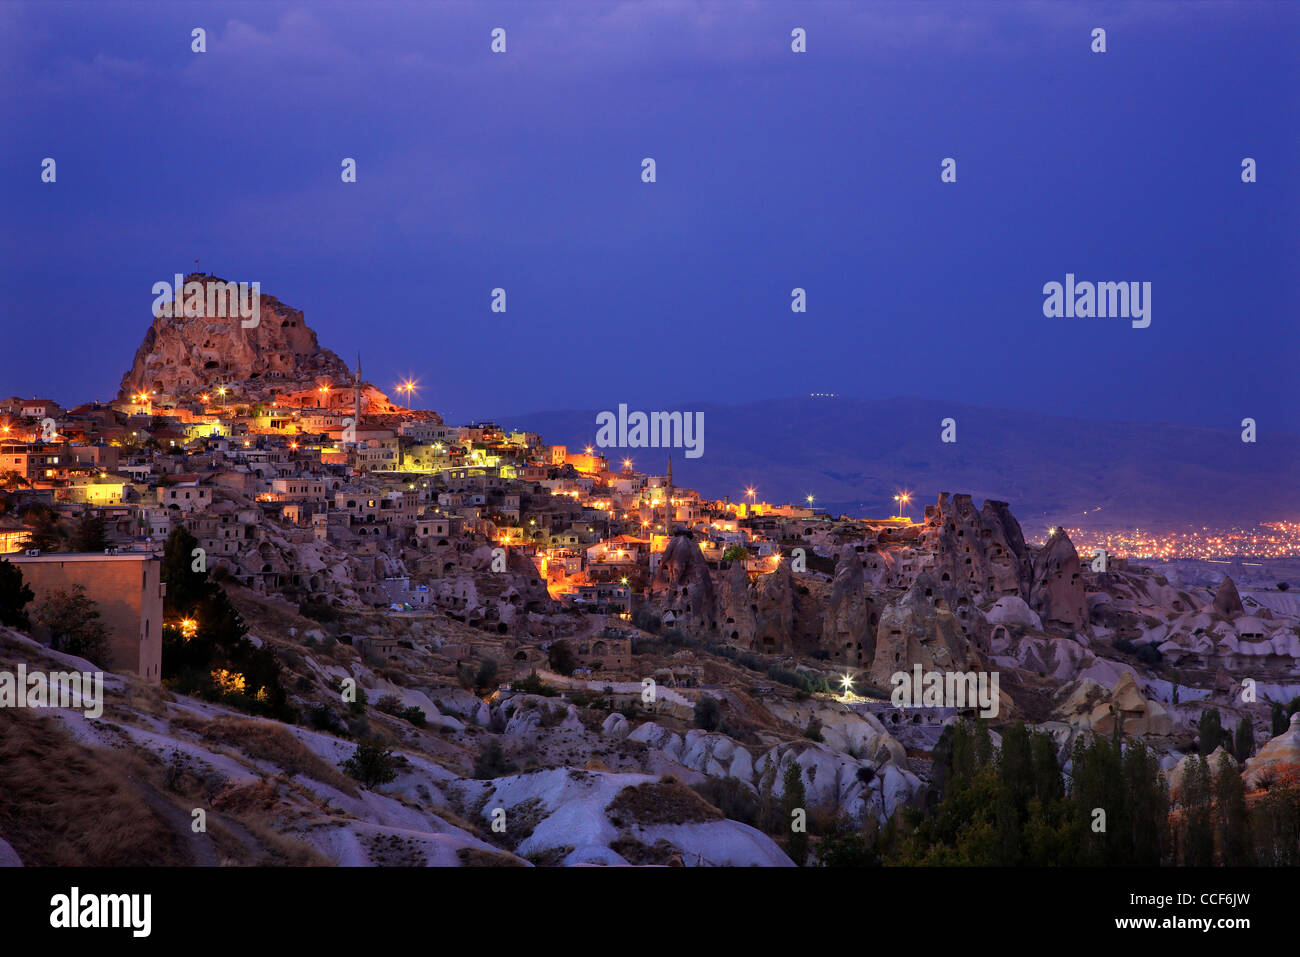 Beautiful Uchisar village with its spectacular rocky castle, at night. Nevsehir, Cappadocia, Turkey - Stock Image